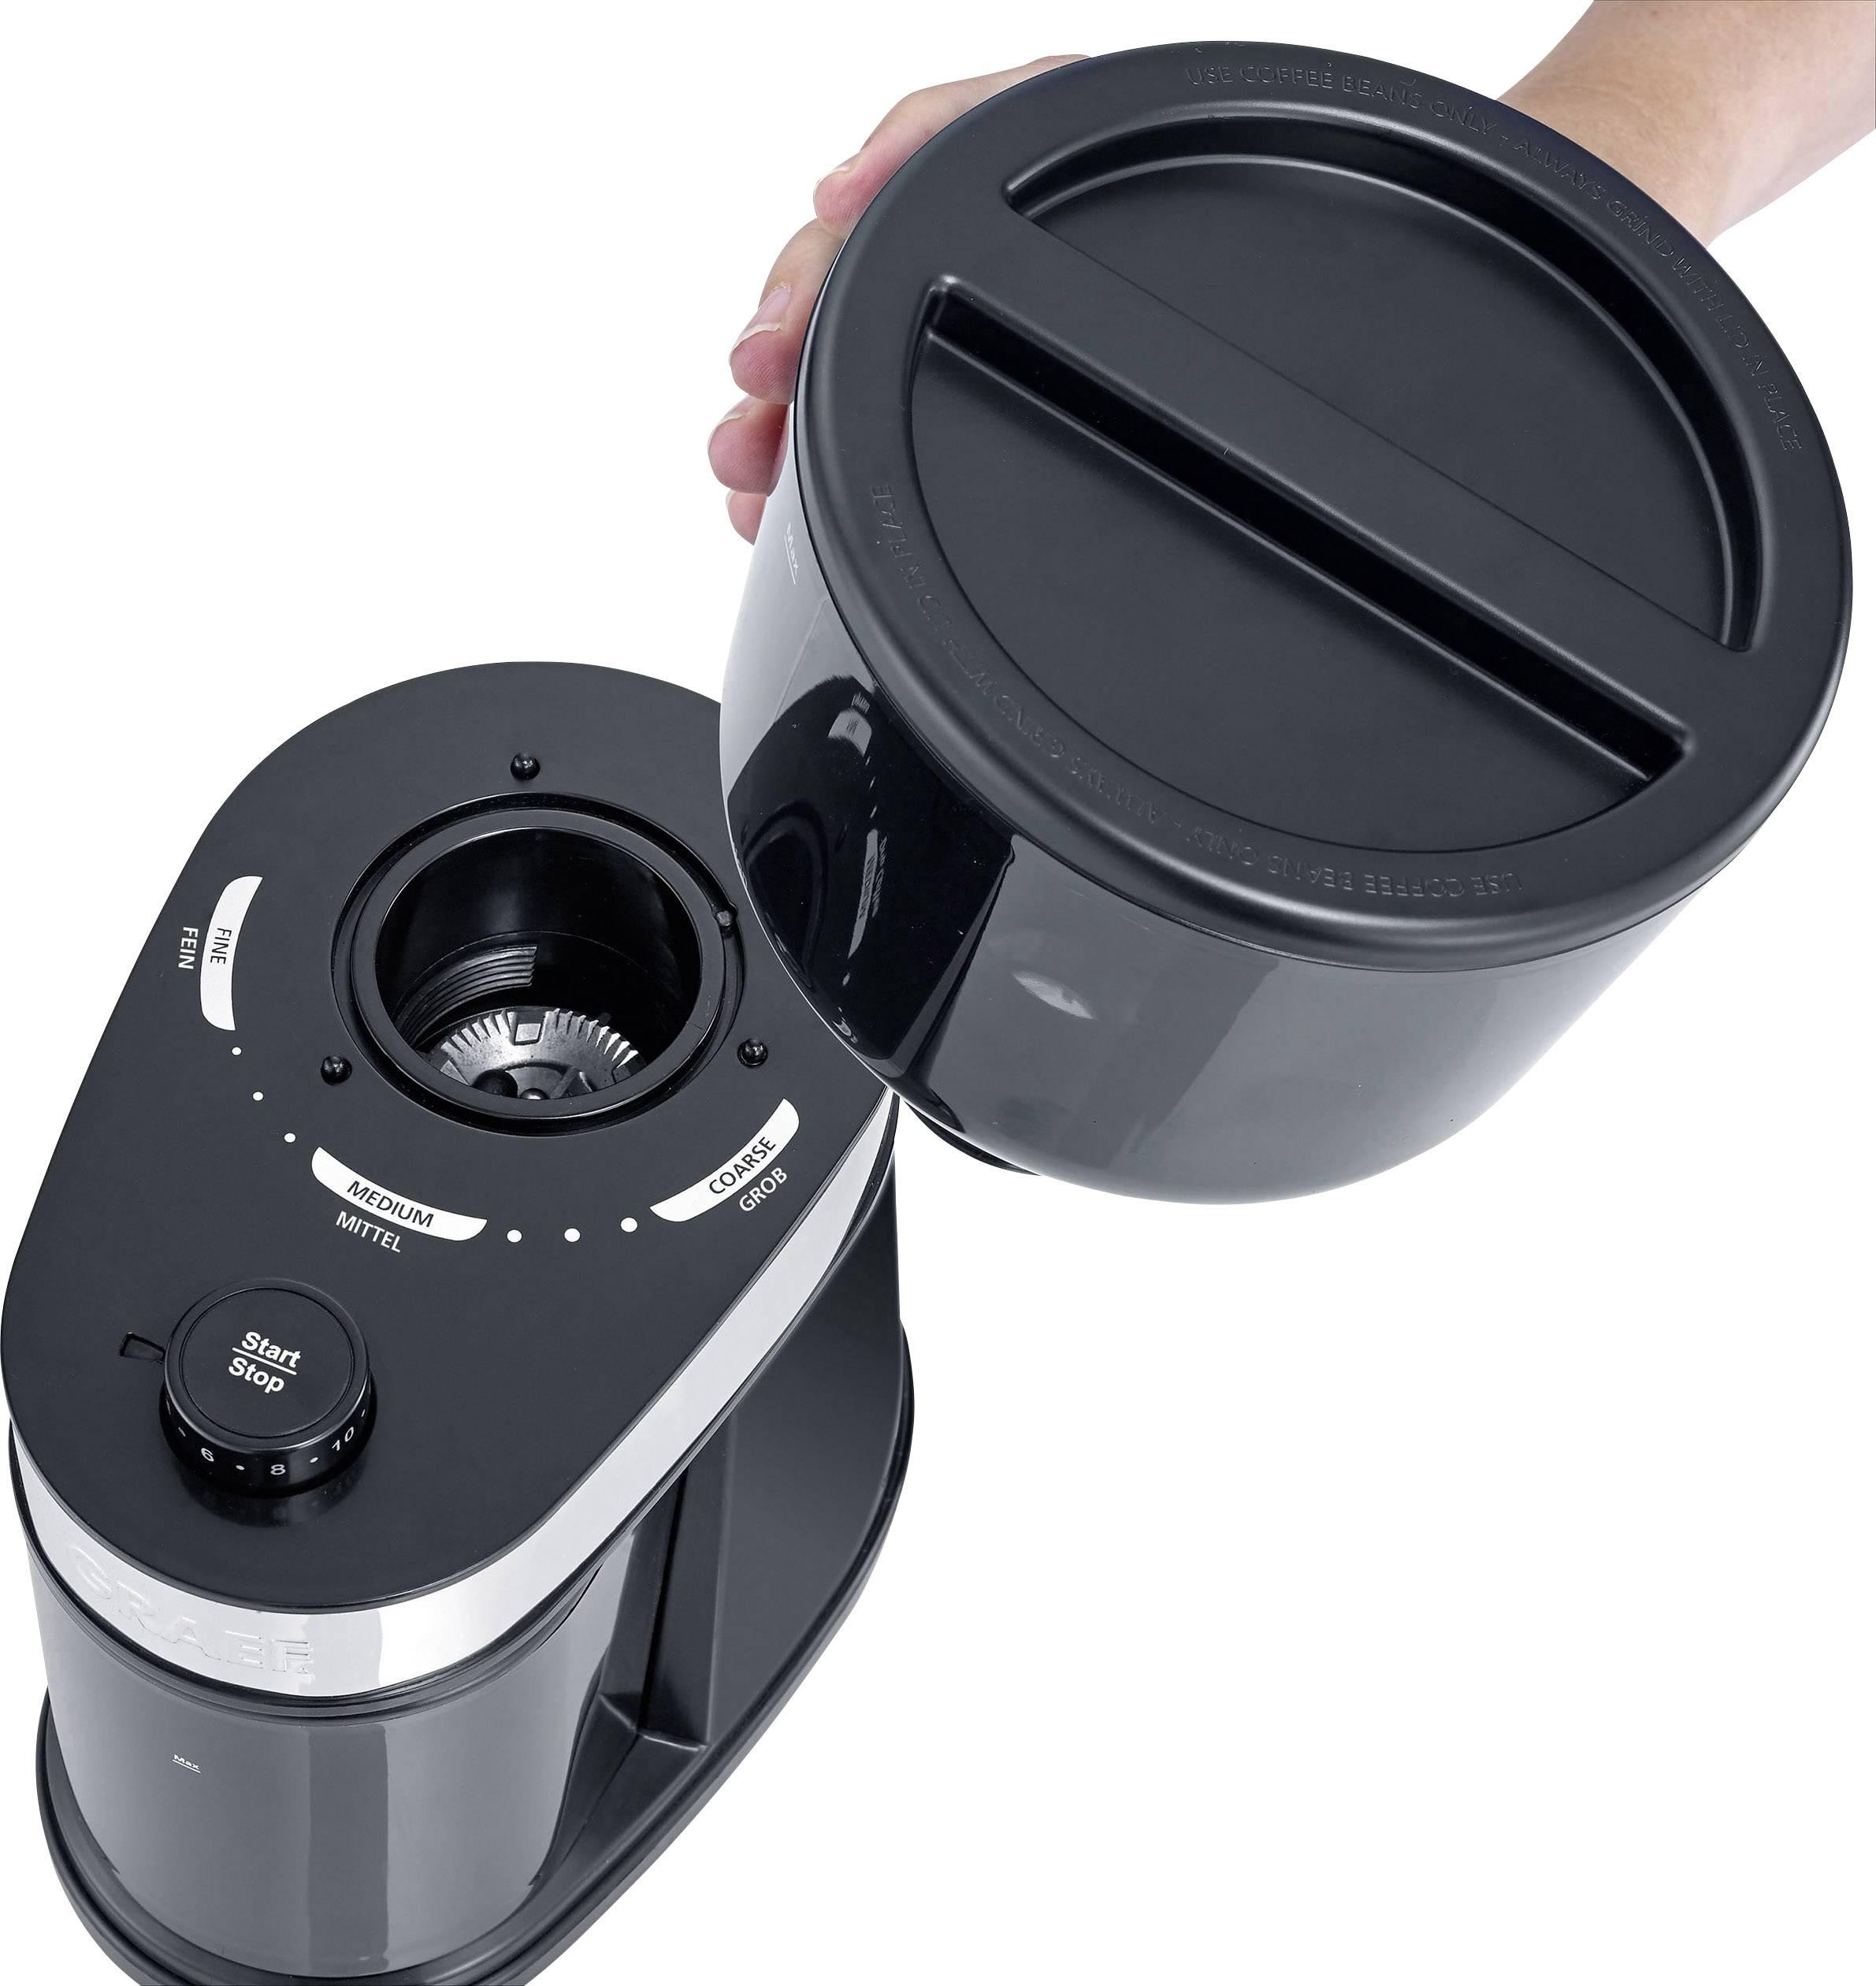 Graef CM202EU CM202EU mlinček za kavo črna nerjaveči mlinček s ploščatim rezilom